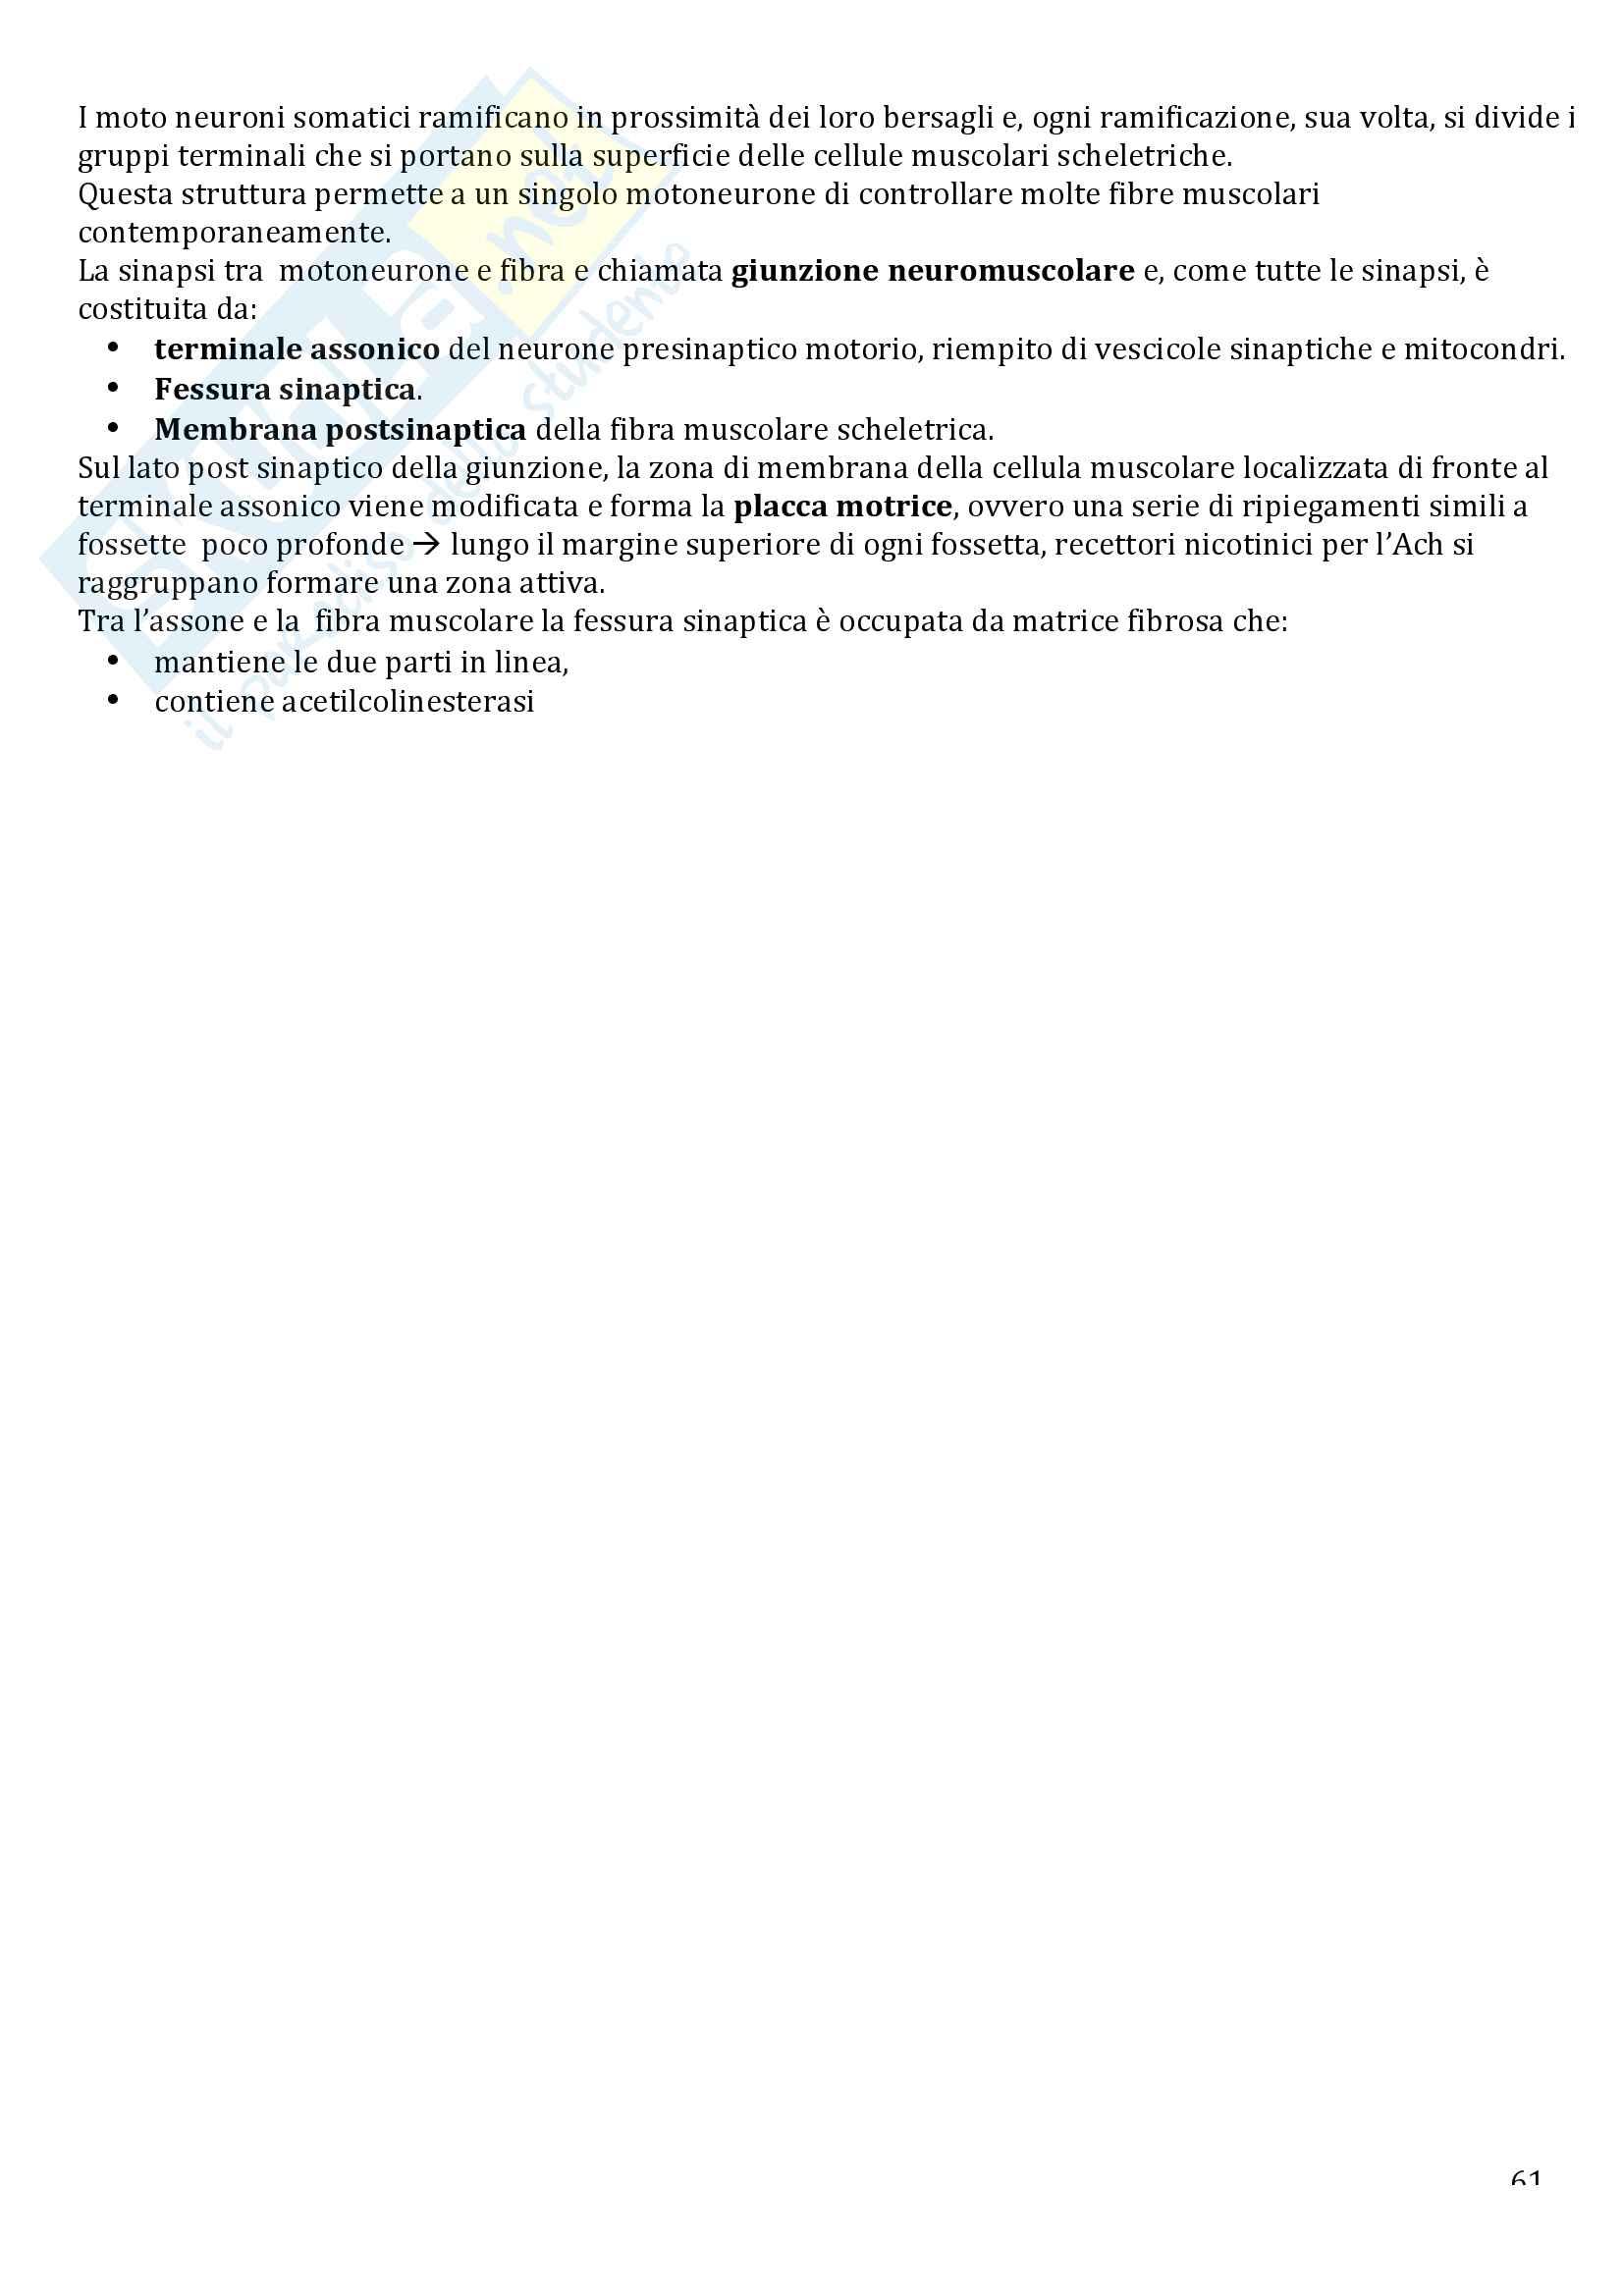 Appunti di fisiologia umana Pag. 61